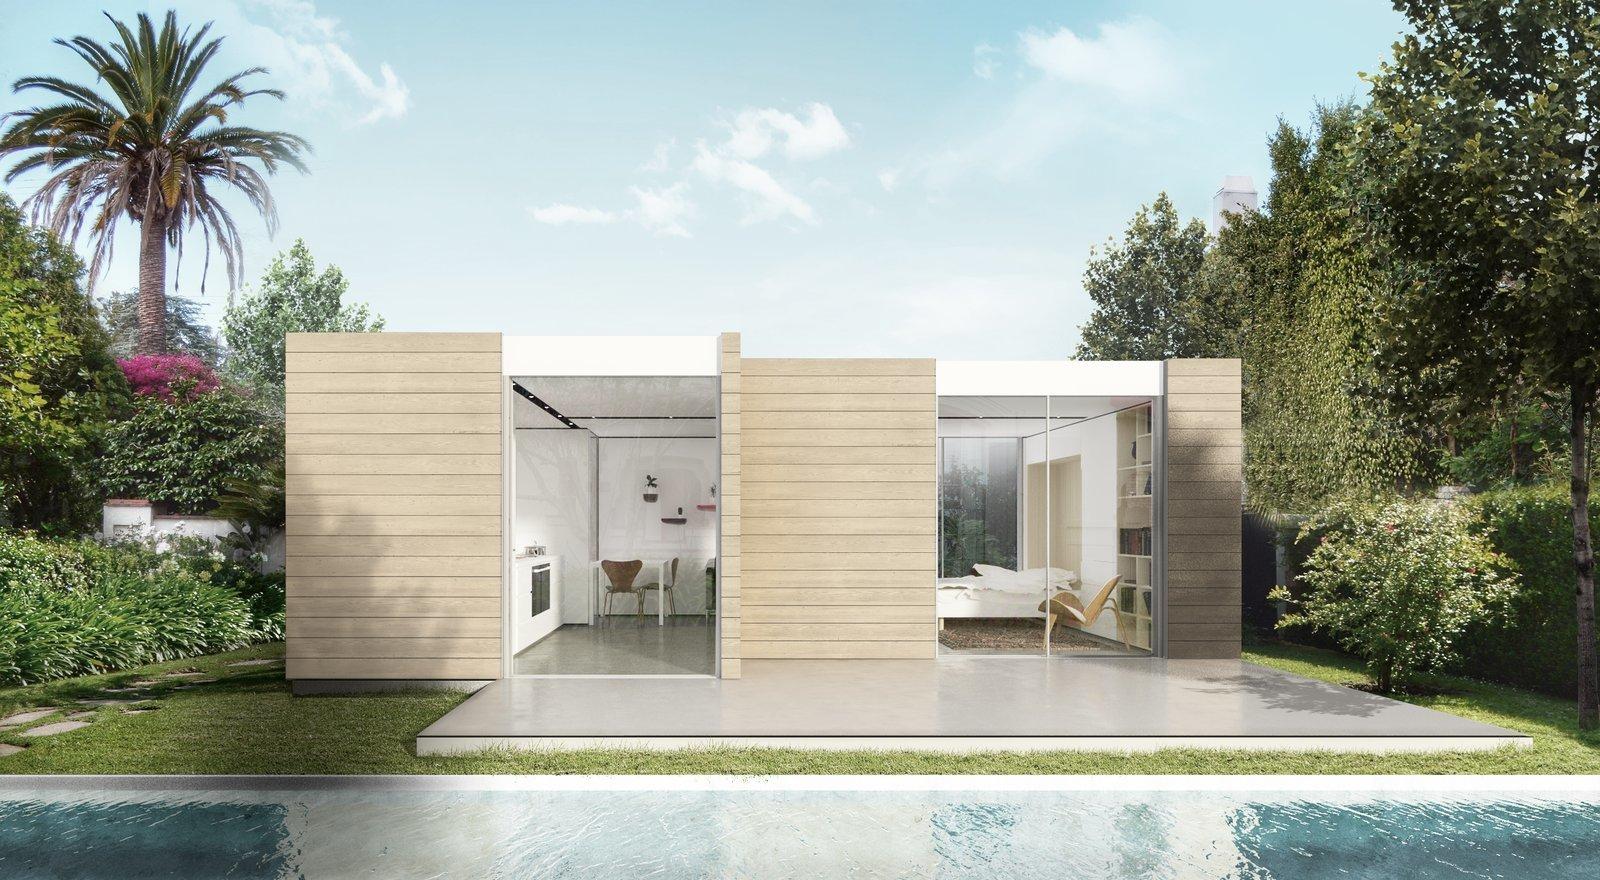 Fundo de casa bonita simples com piscina